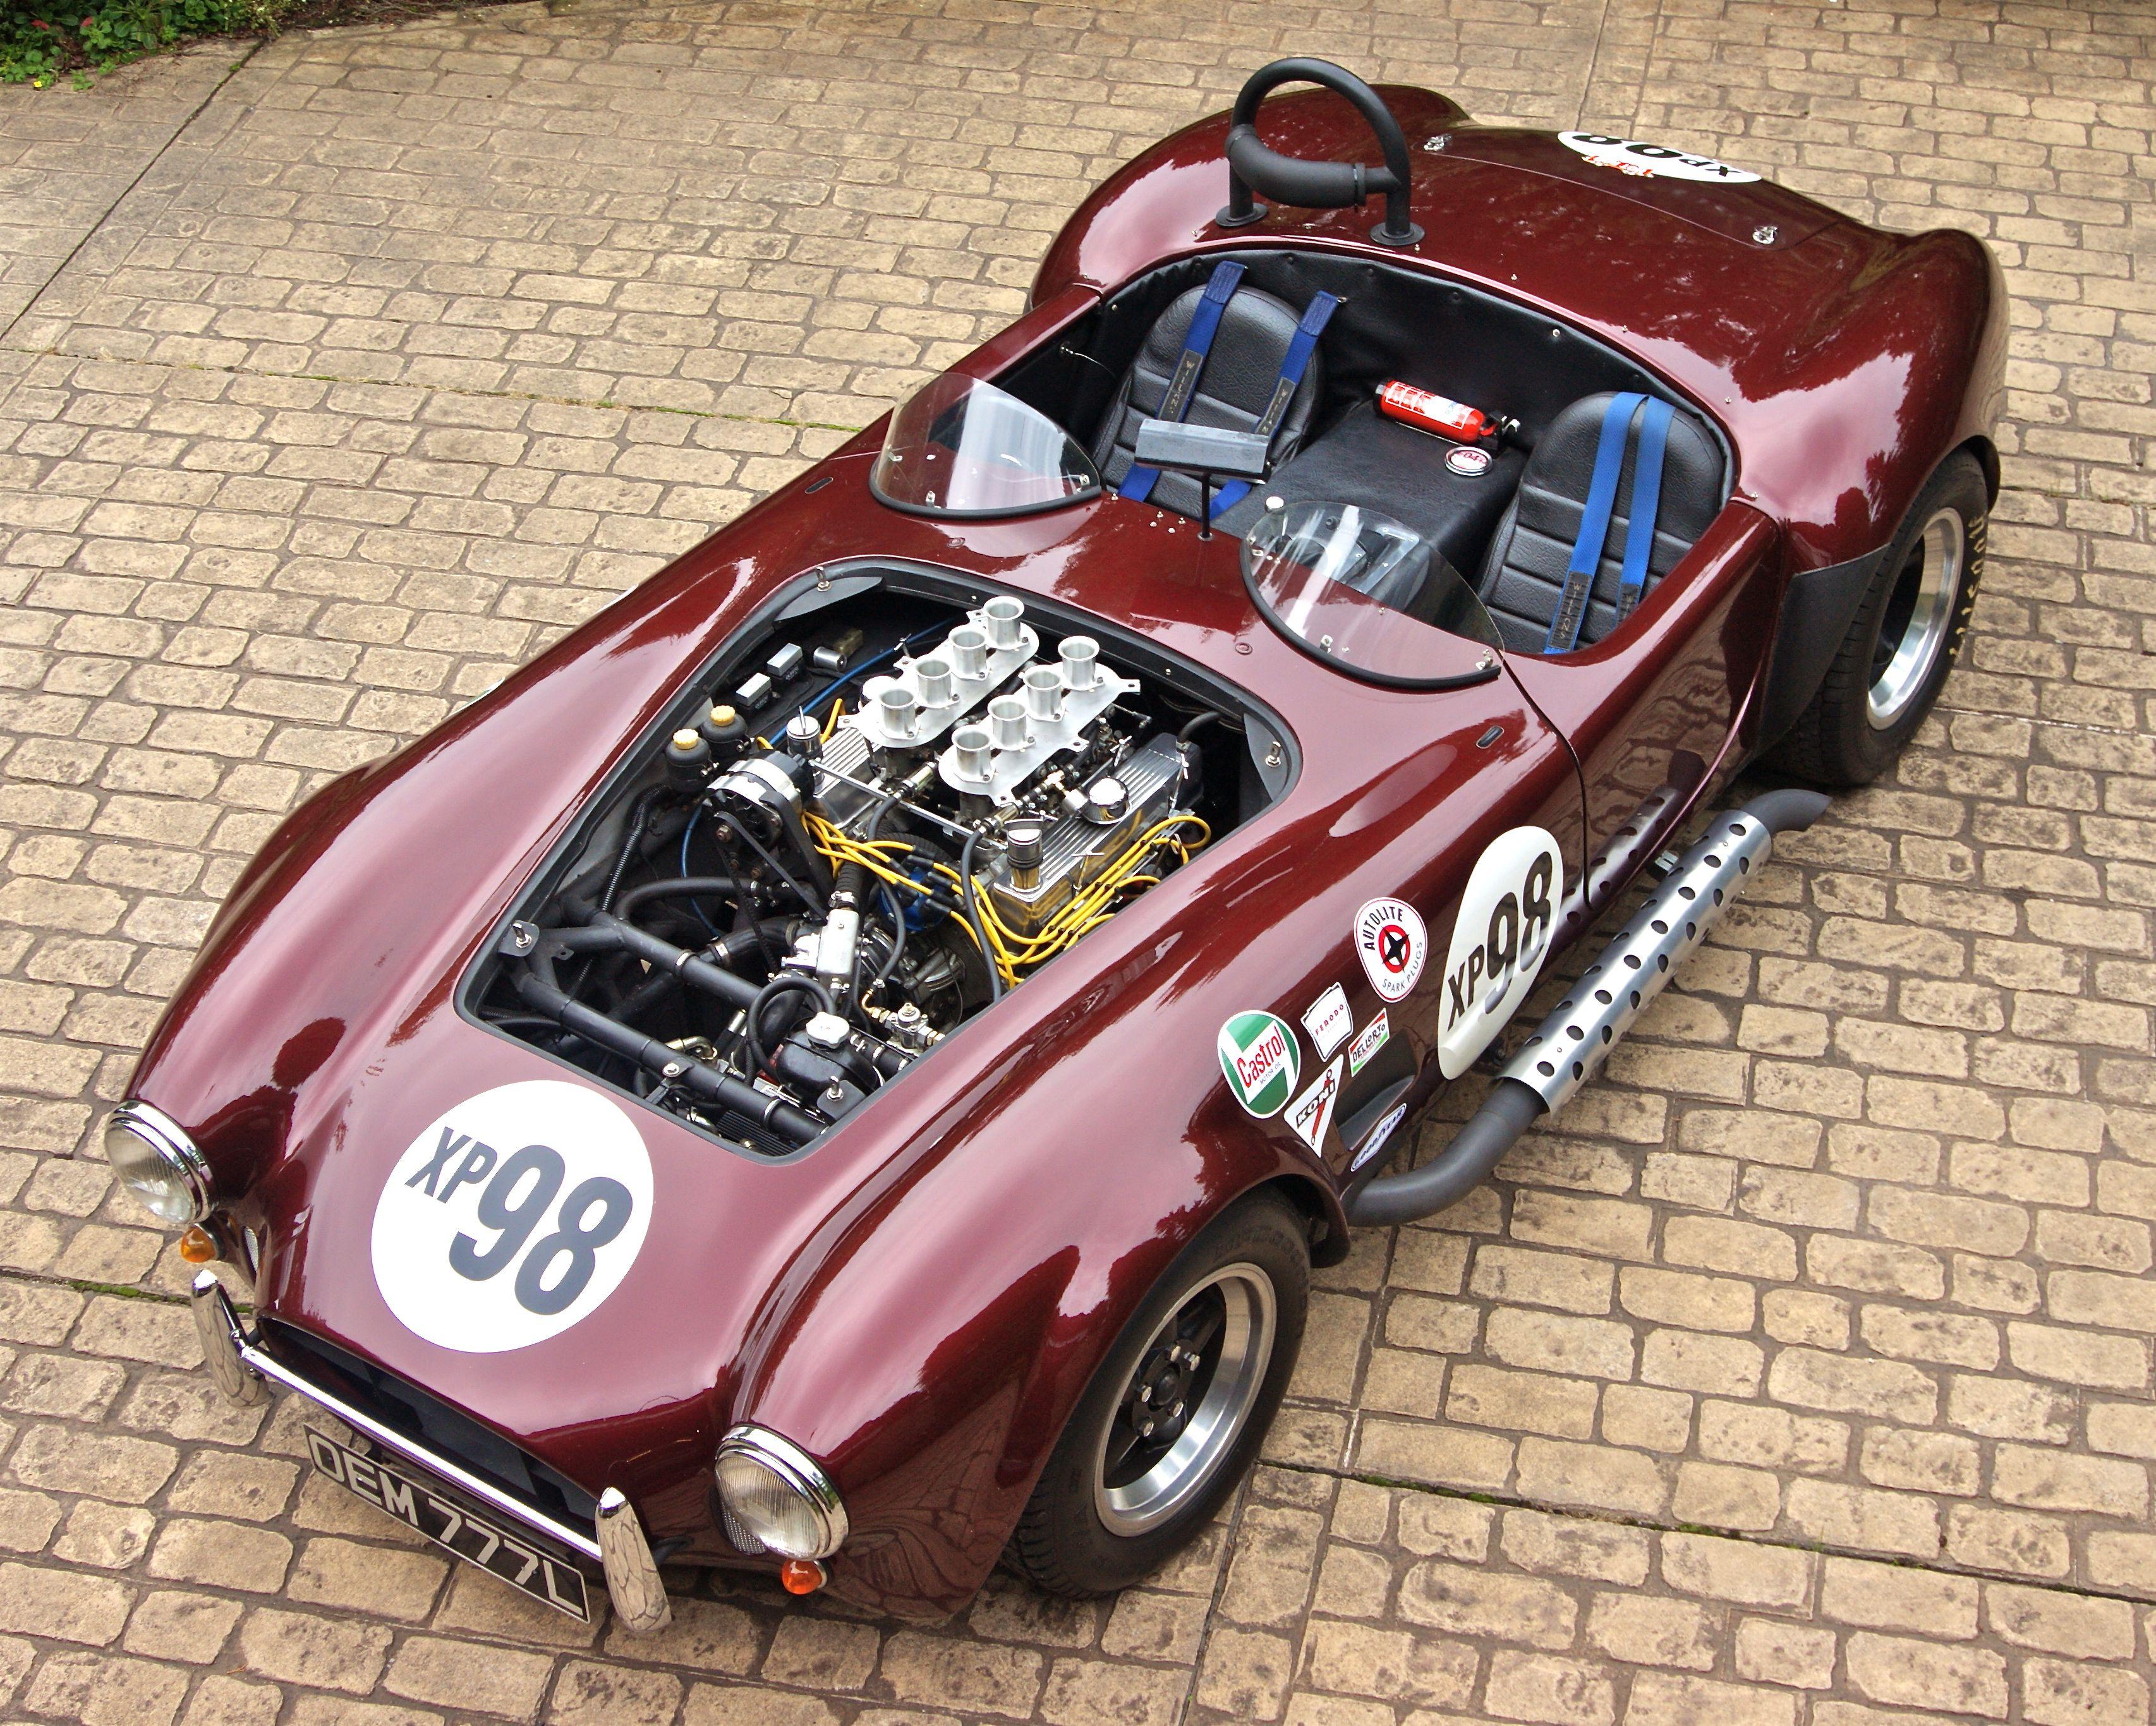 Magnum 427 ac shelby cobra replica xp98 red burgundy side pipes downdraft carburetors